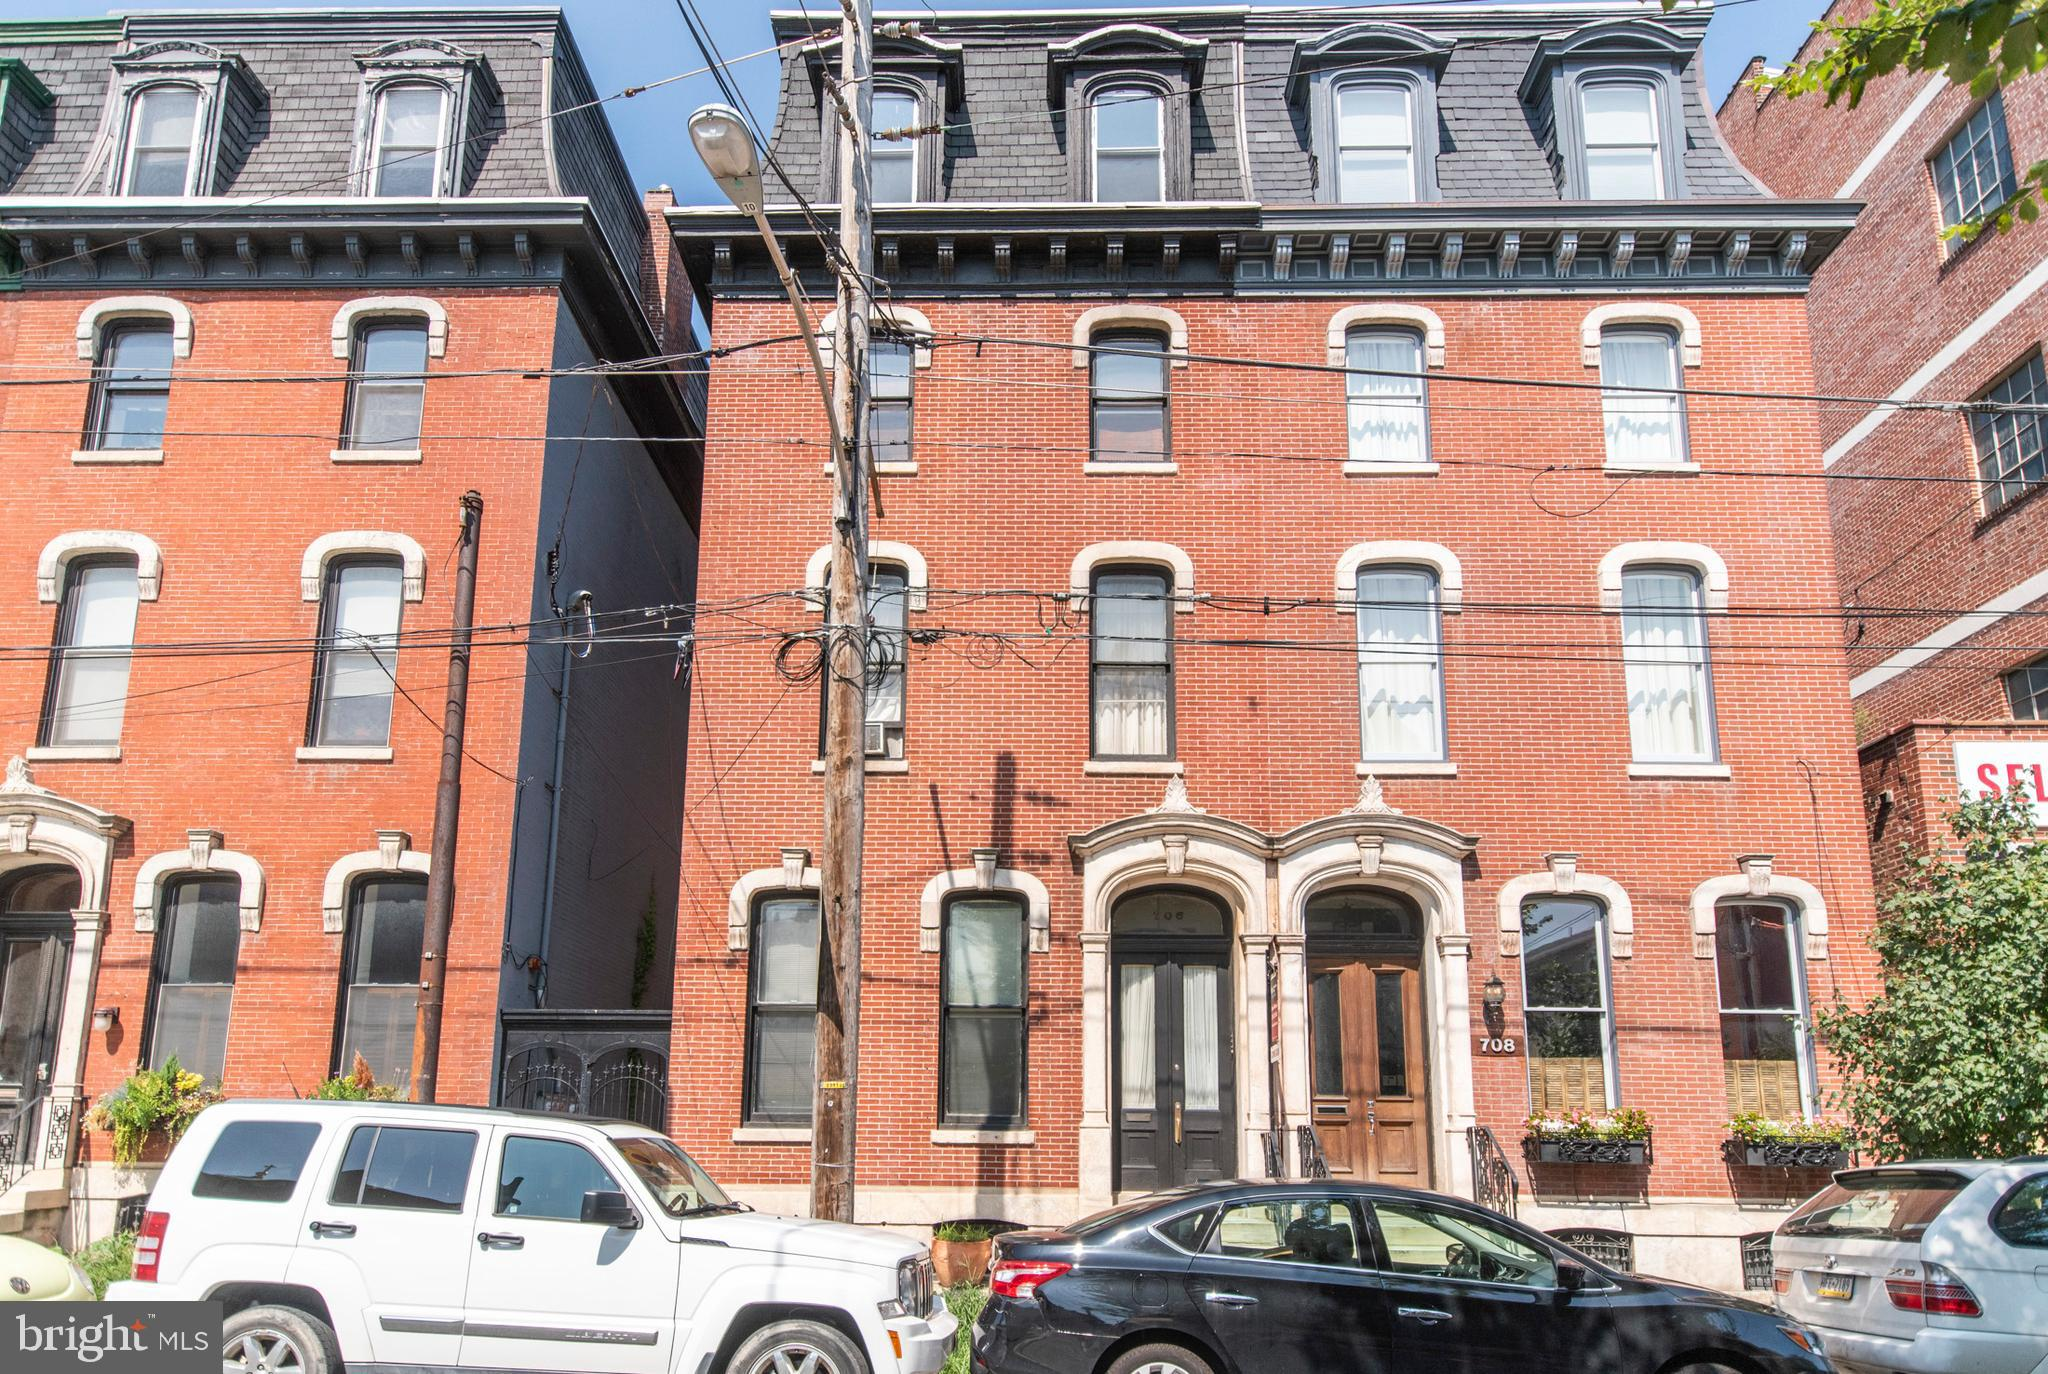 706 N 5TH STREET, PHILADELPHIA, PA 19123